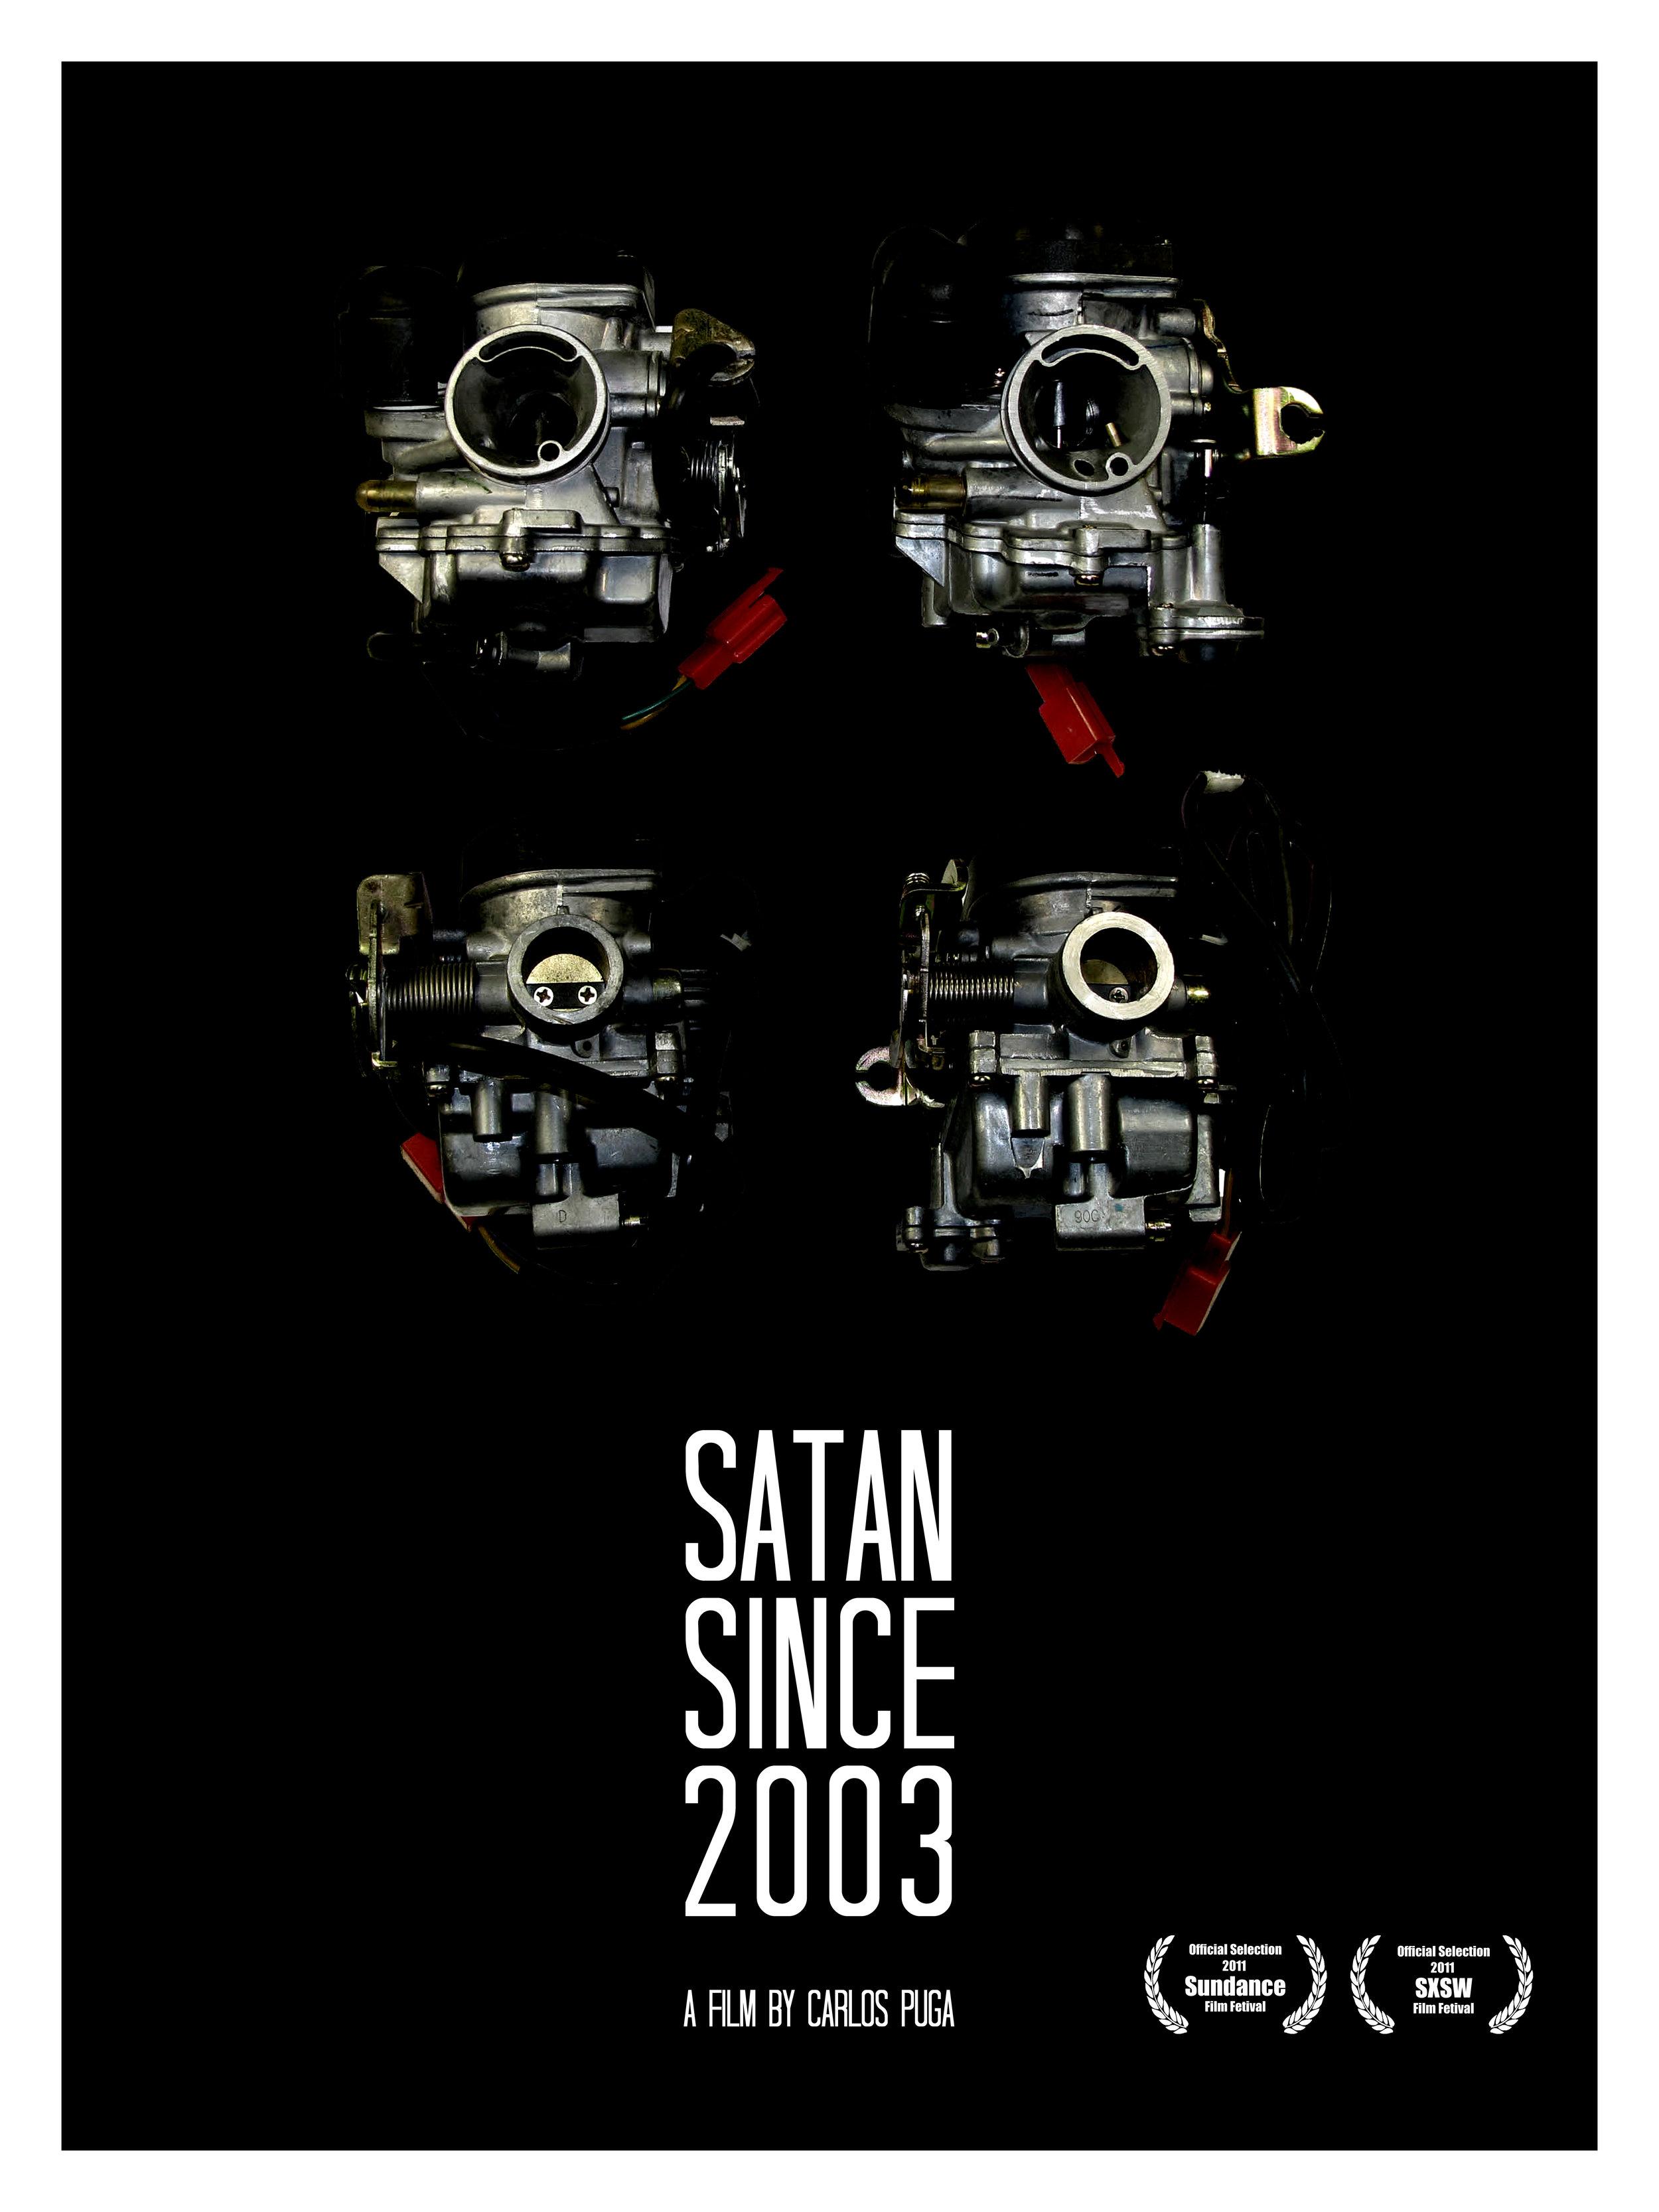 SS2003_POSTER_withlaurels.jpg